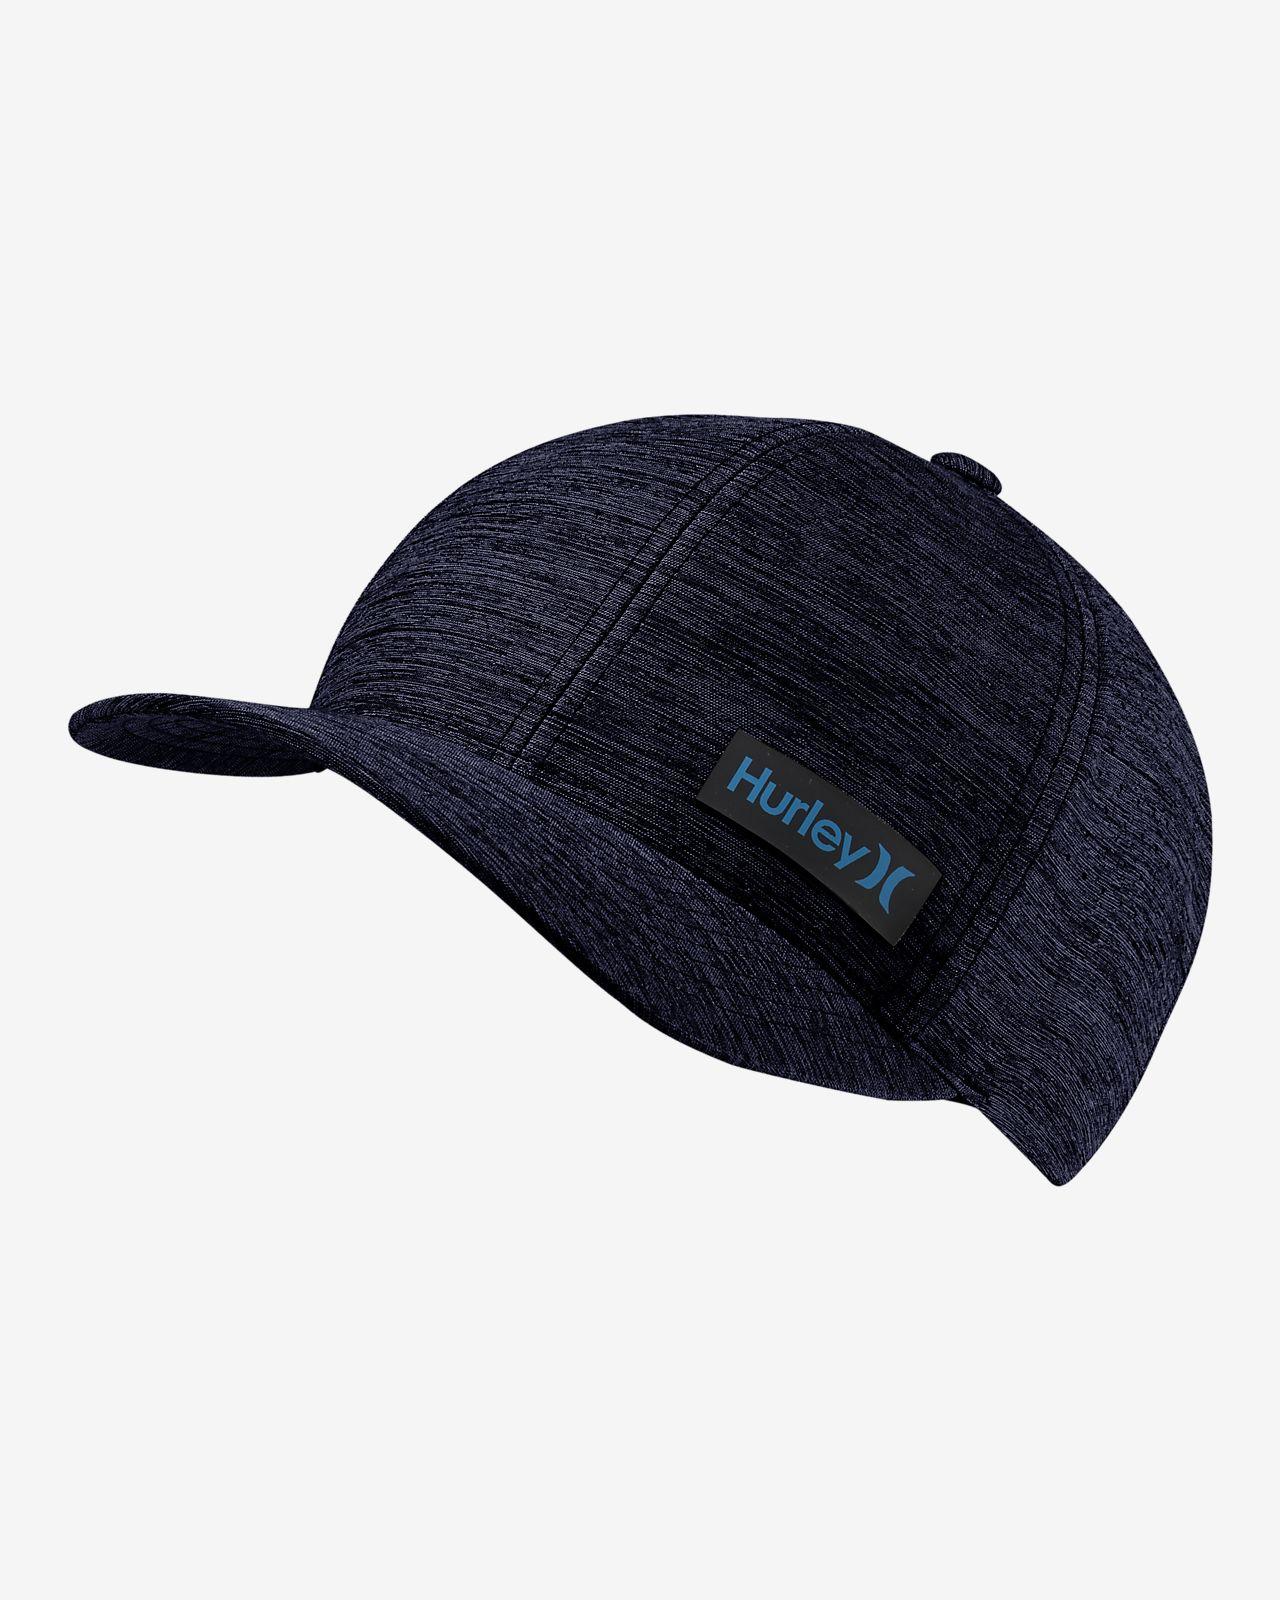 Hurley Dri-FIT Marwick Elite Men's Hat